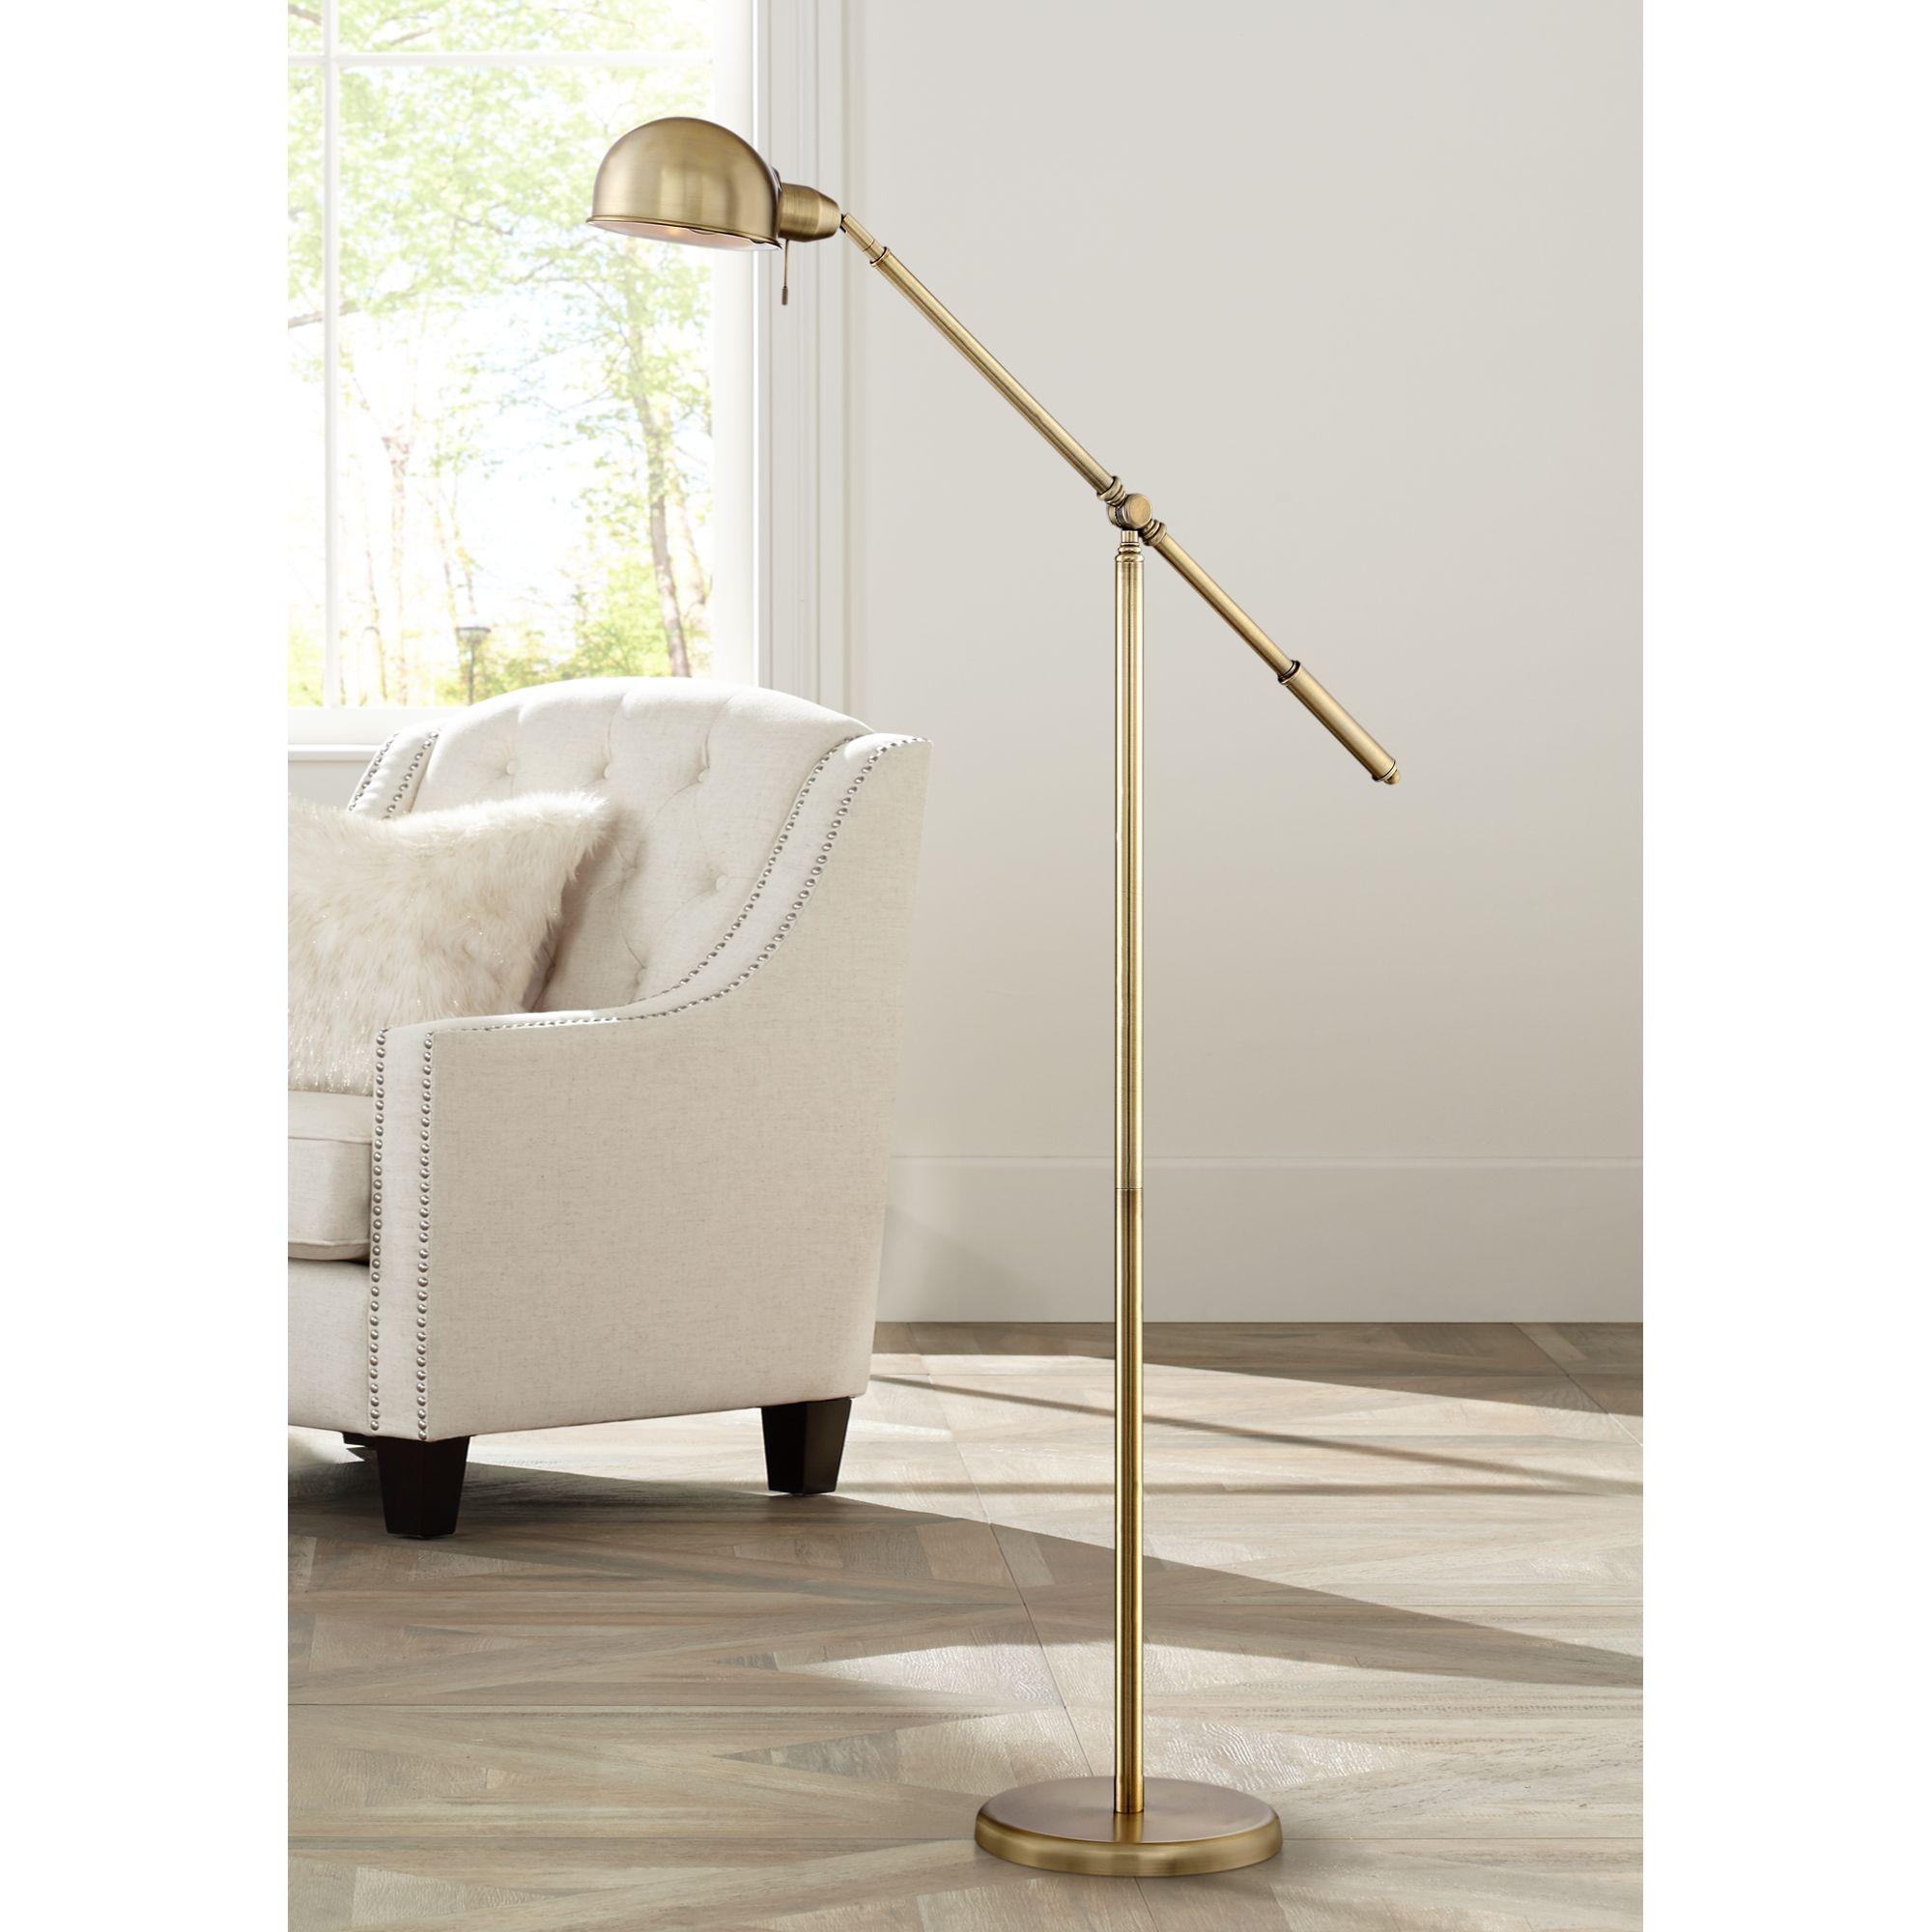 360 Lighting Dawson Antique Brass Pharmacy Floor Lamp by 360 Lighting